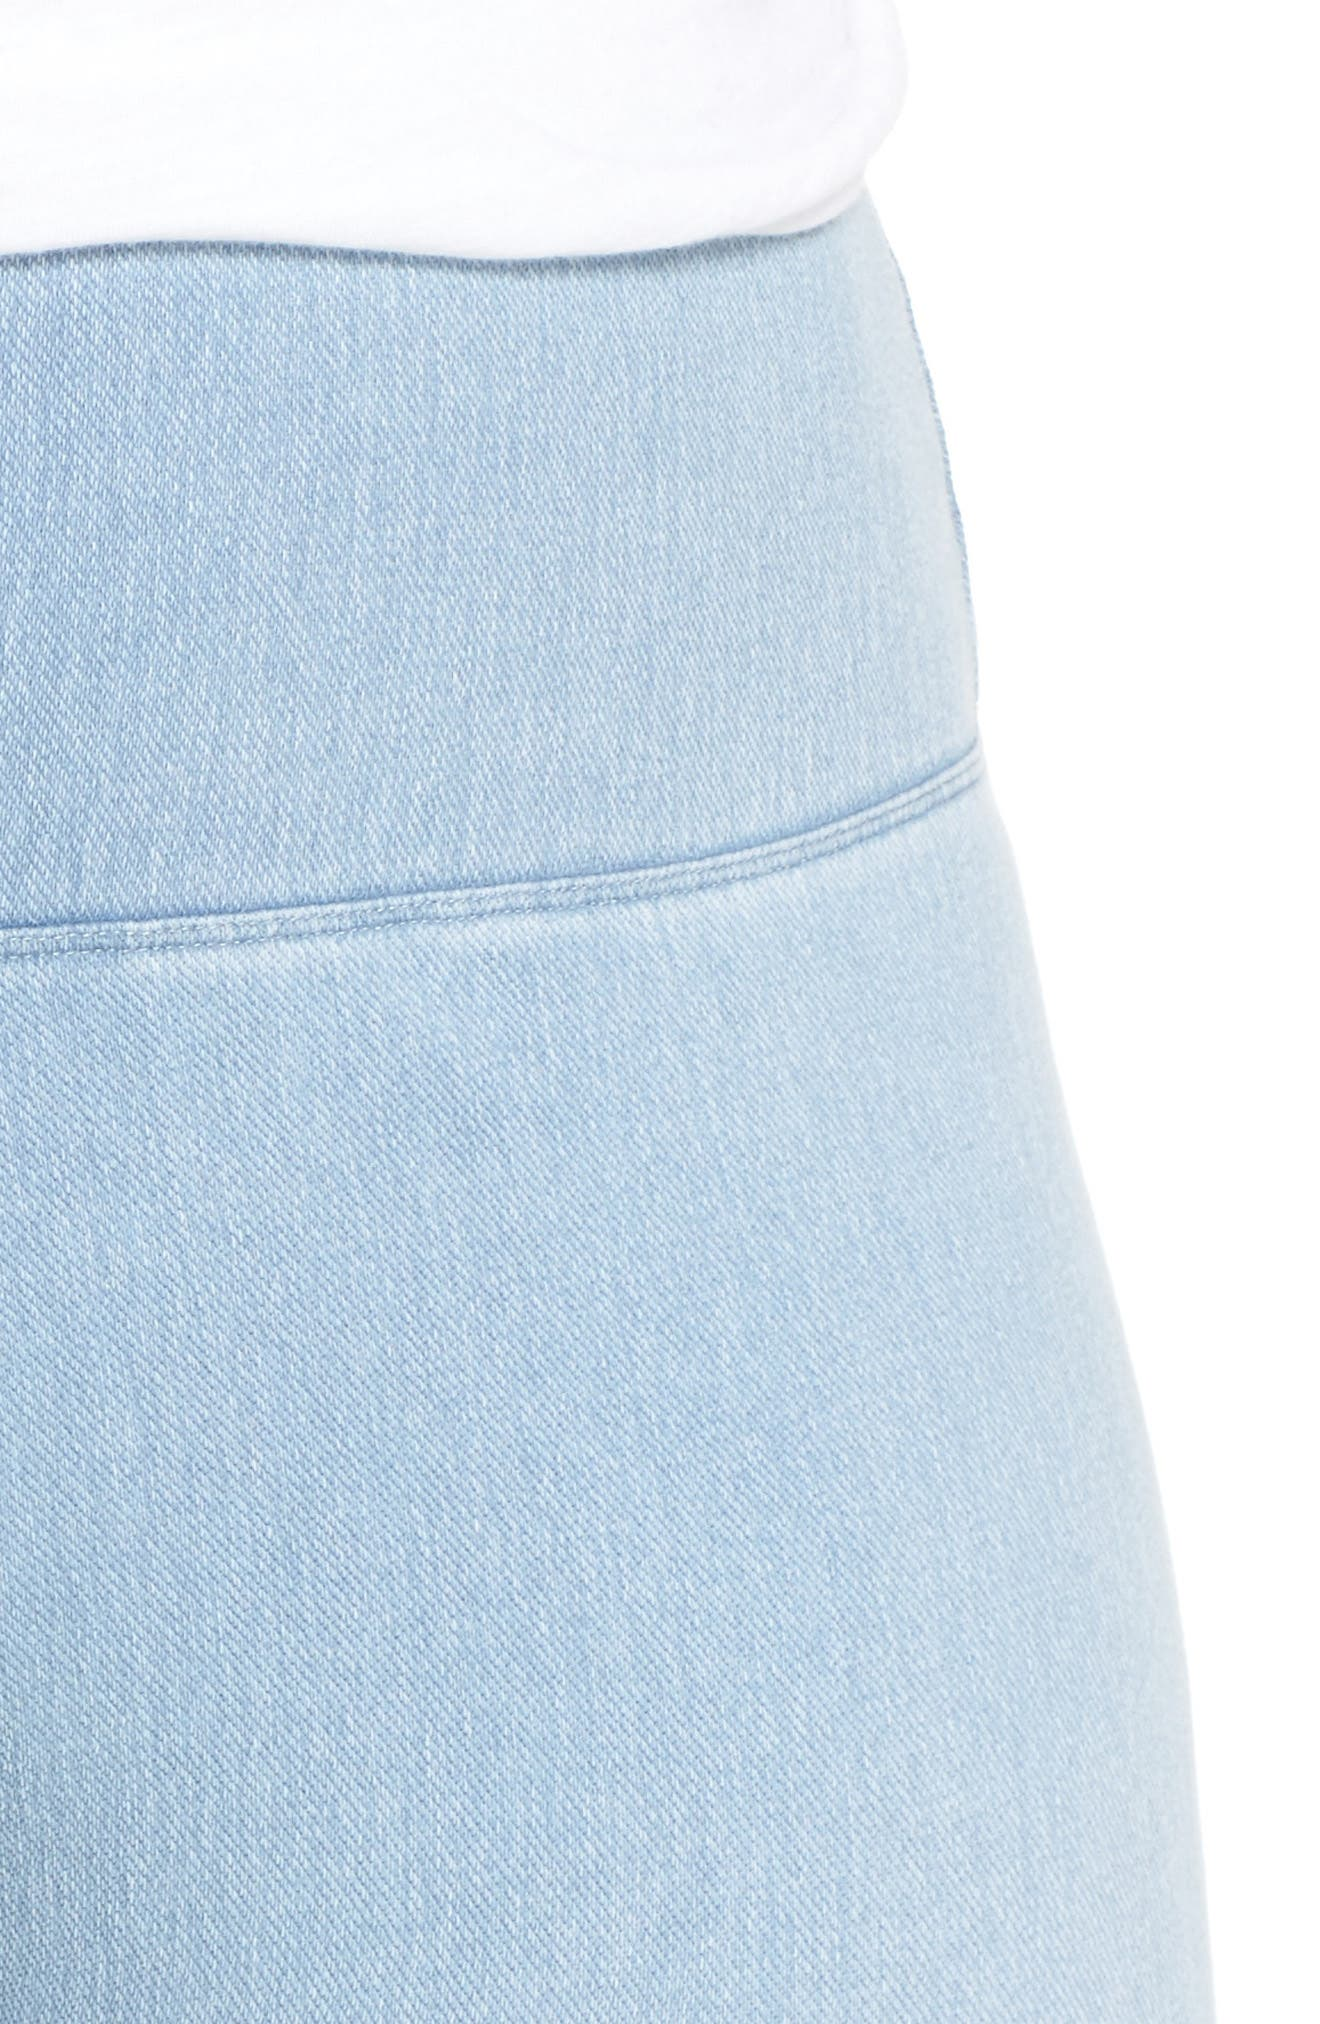 Stretch Denim Leggings,                             Alternate thumbnail 4, color,                             Cashmere Blue